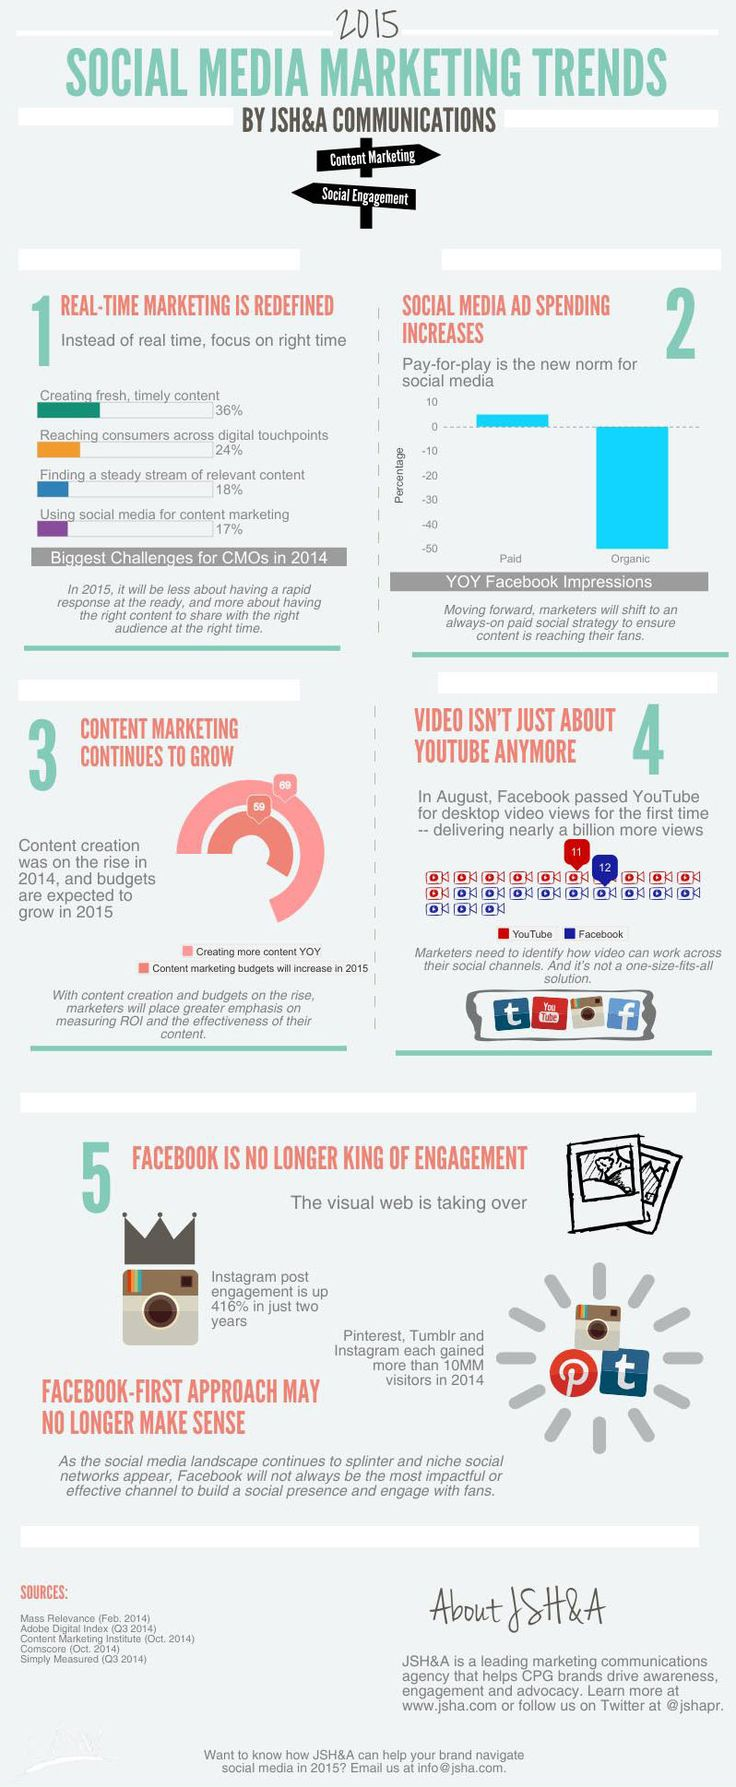 5 Social Media Marketing Trends for 2015 [INFOGRAPHIC]